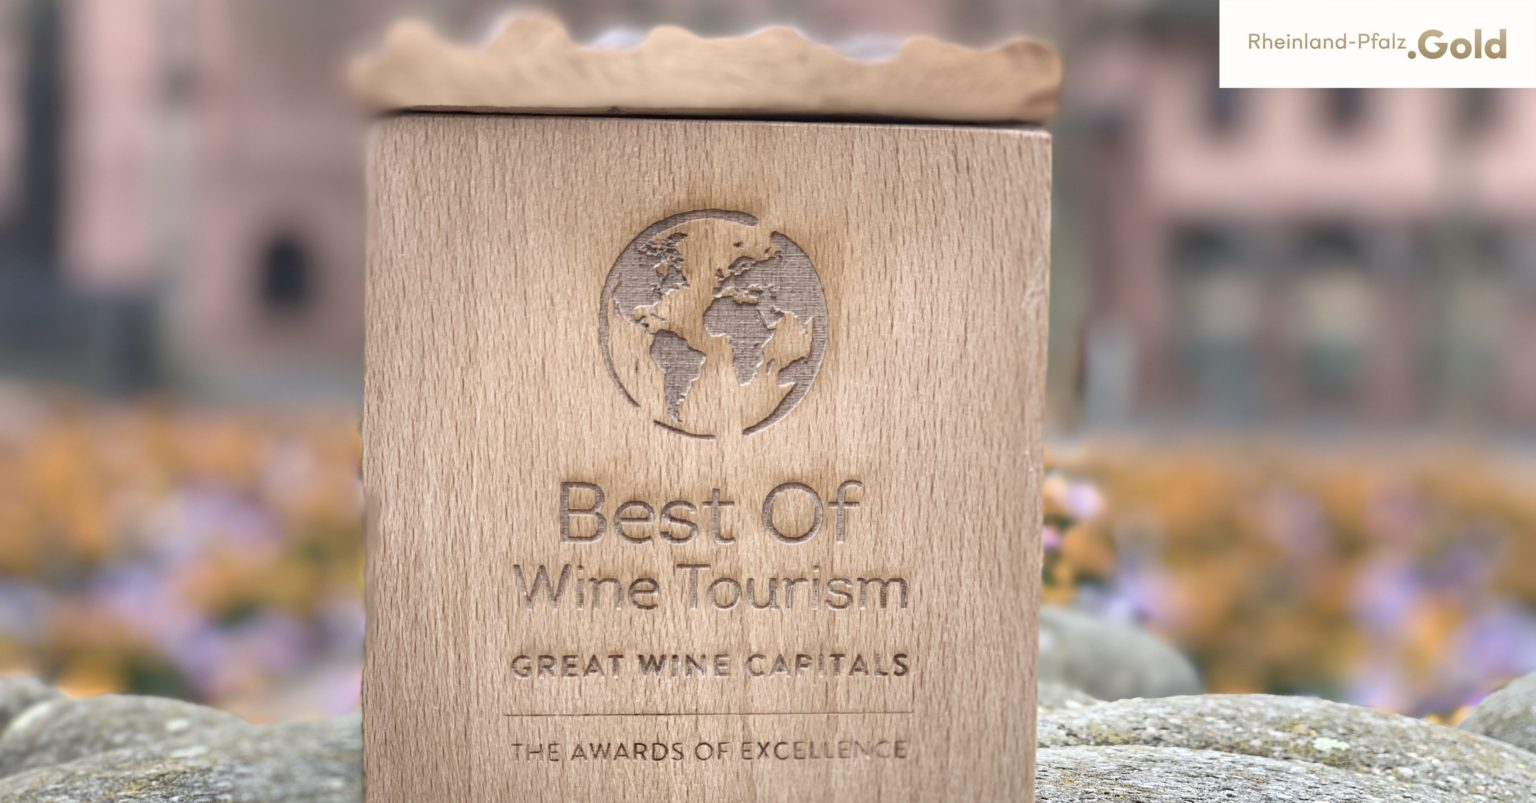 Best of Wine Tourism Award